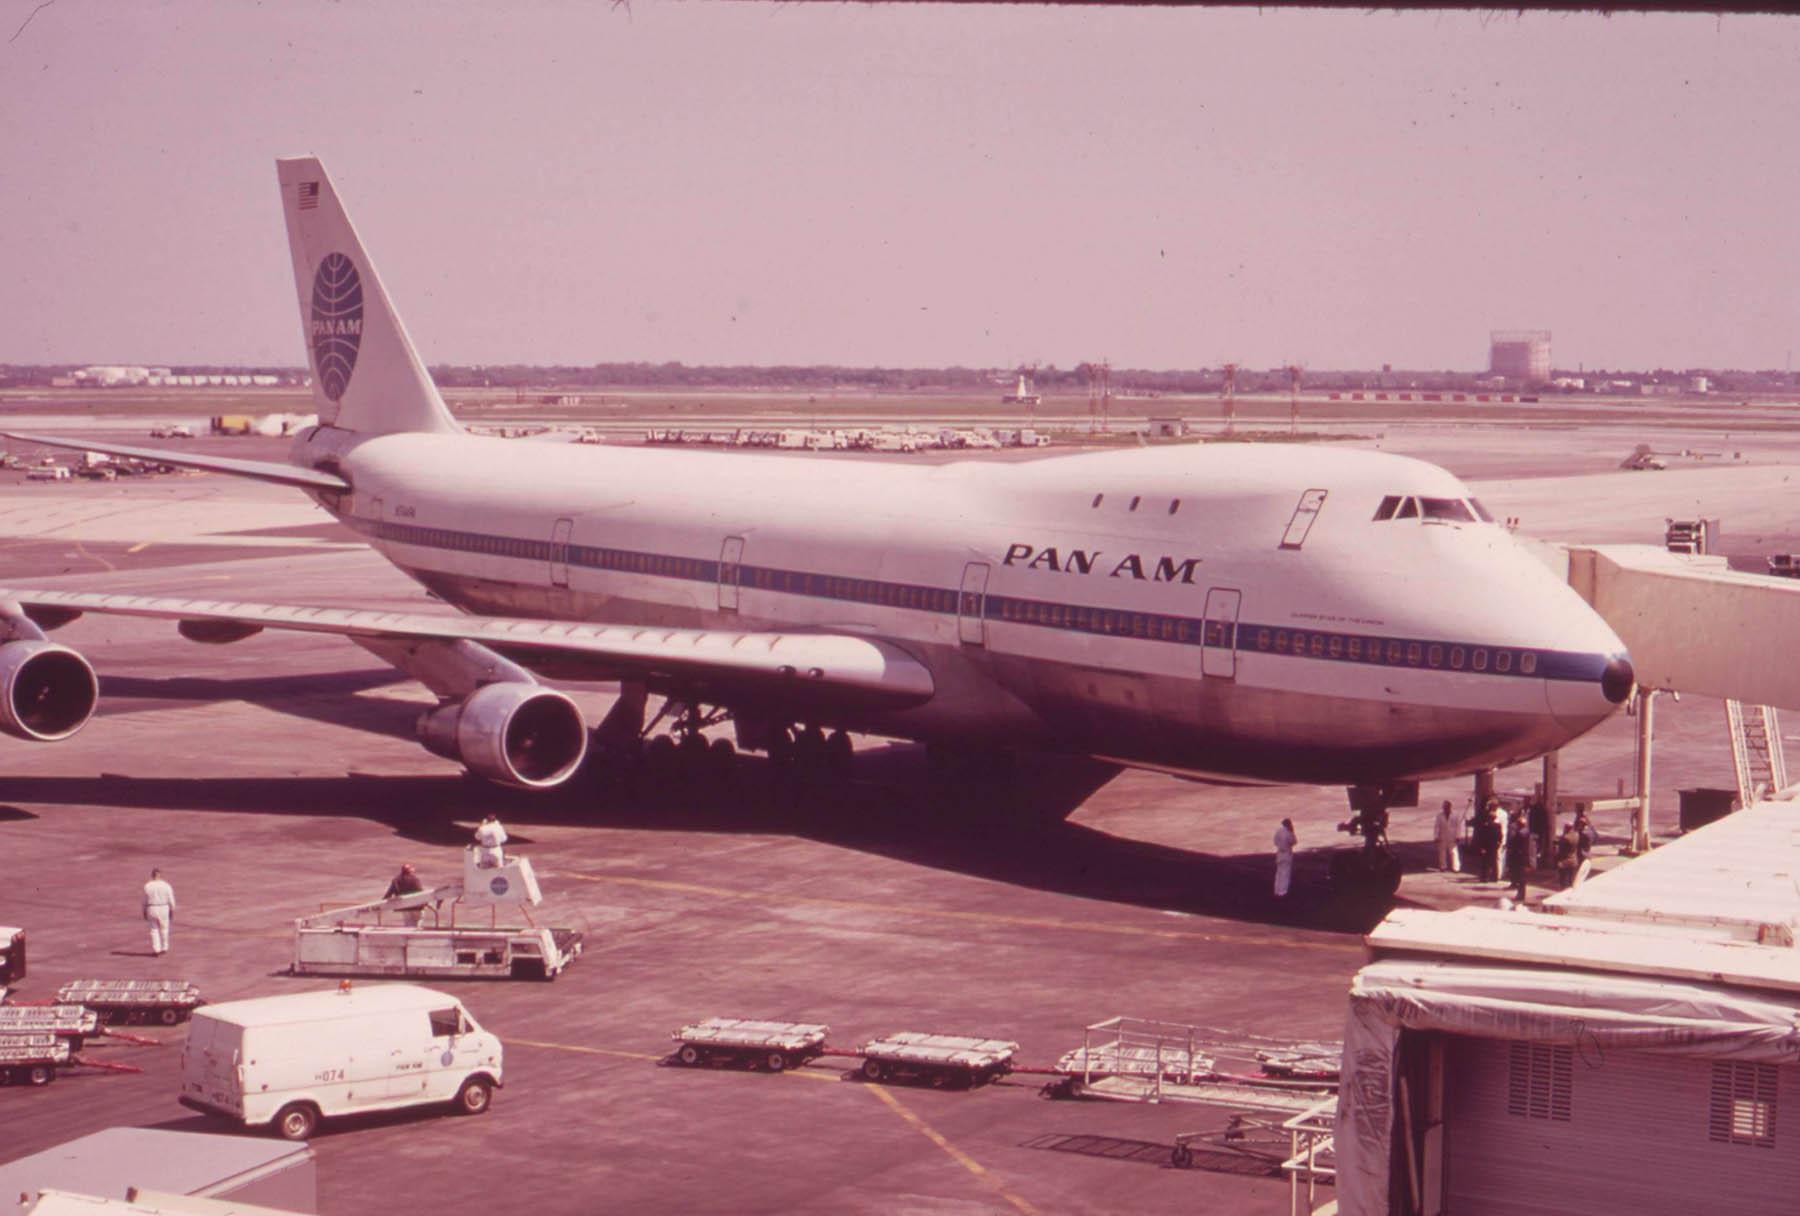 retro photo of an old plane